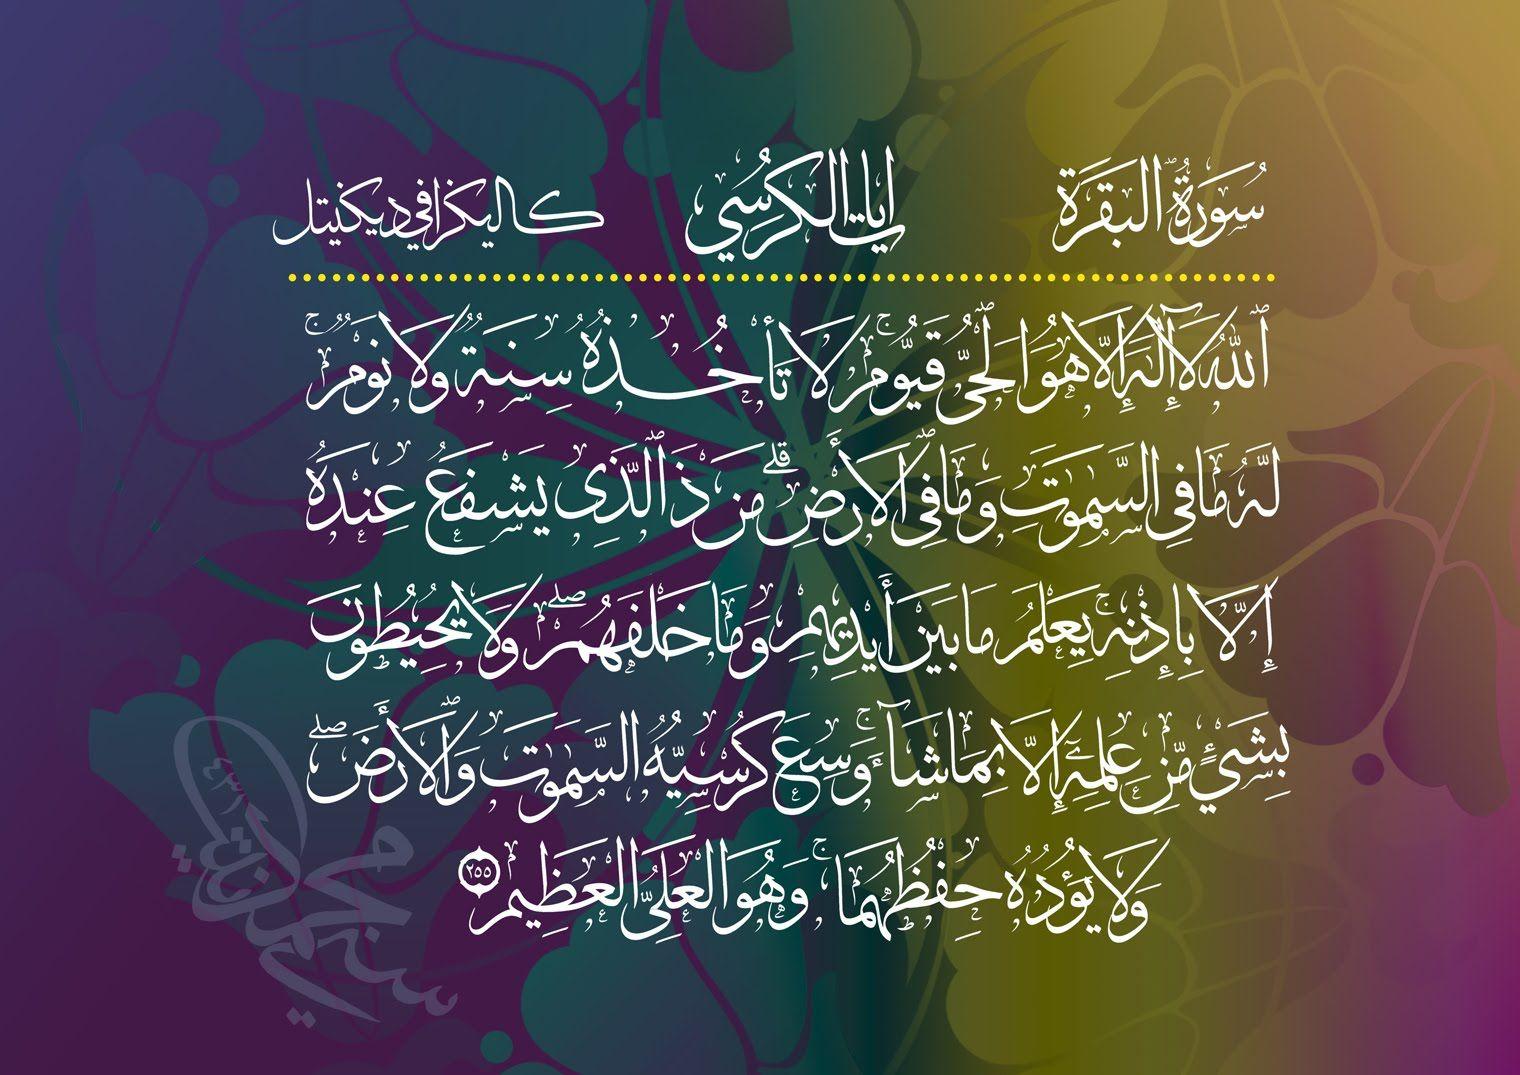 Wallpaper iphone kaligrafi - Download Image Kaligrafi Ayat Quran Pc Android Iphone And